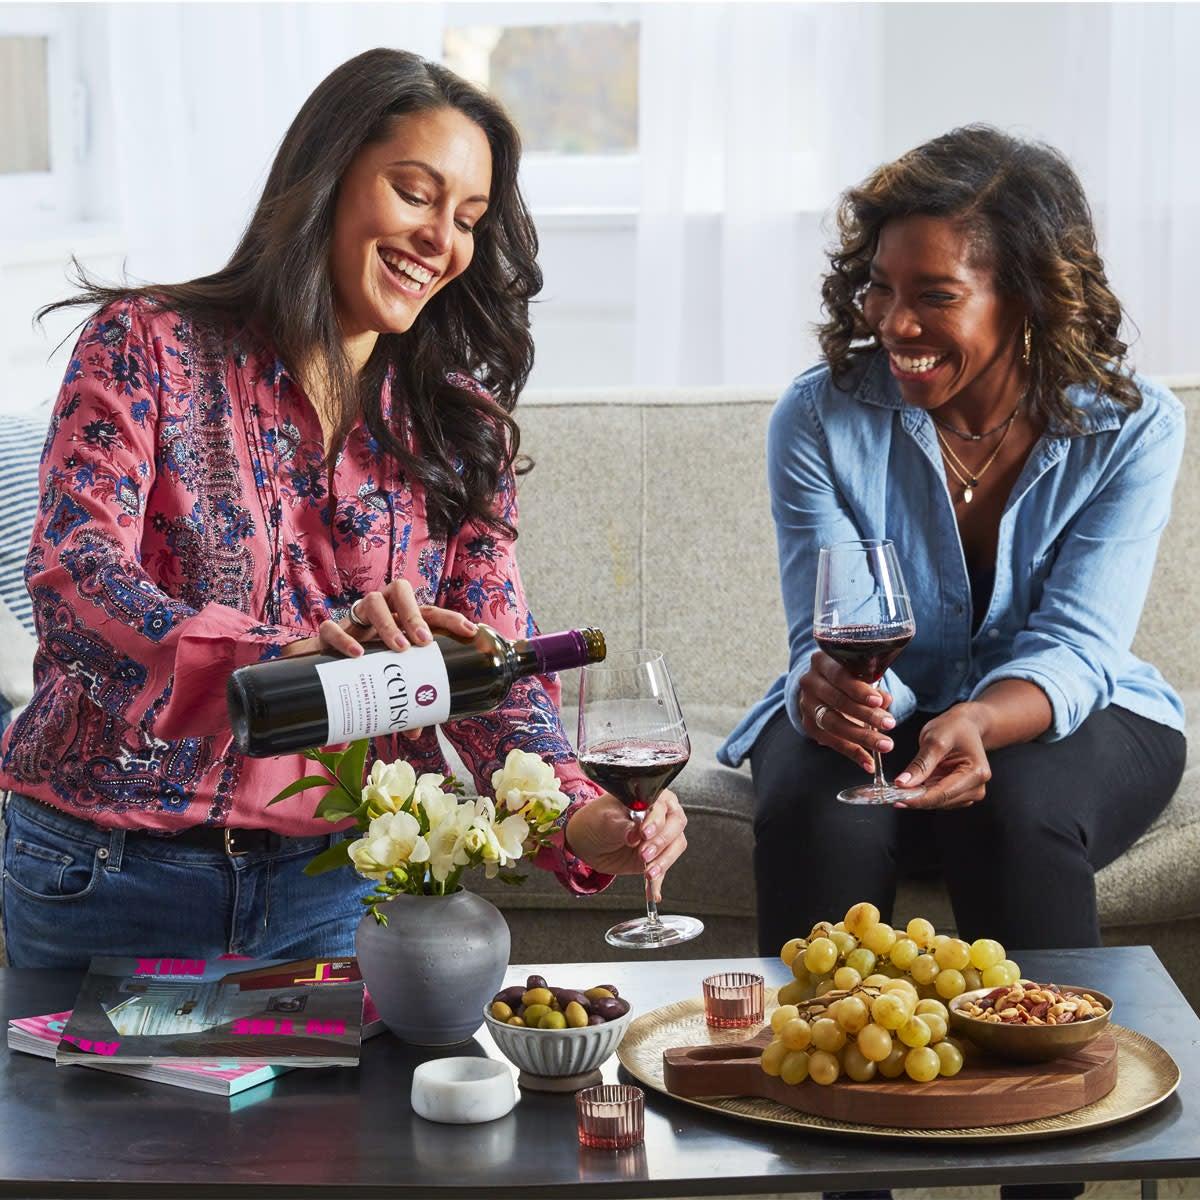 wine glass lifestyle image